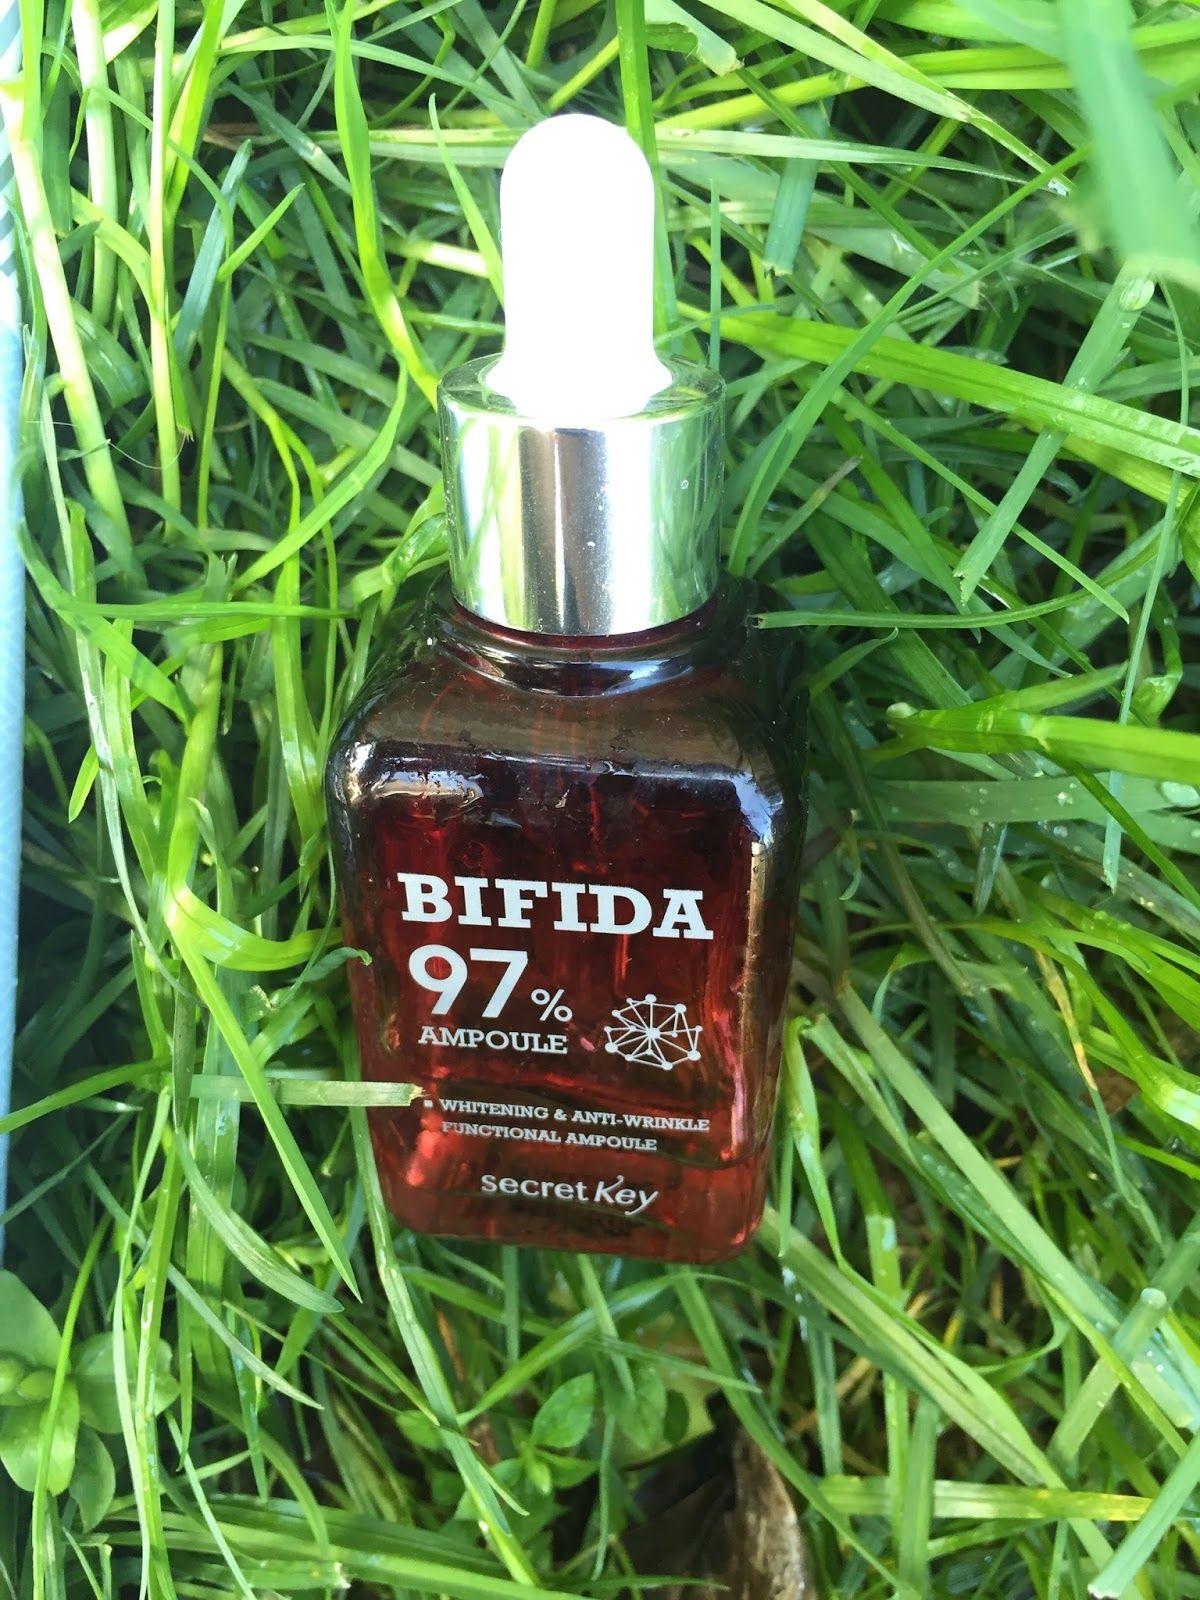 Secret Key Bifida 97% Ampoule